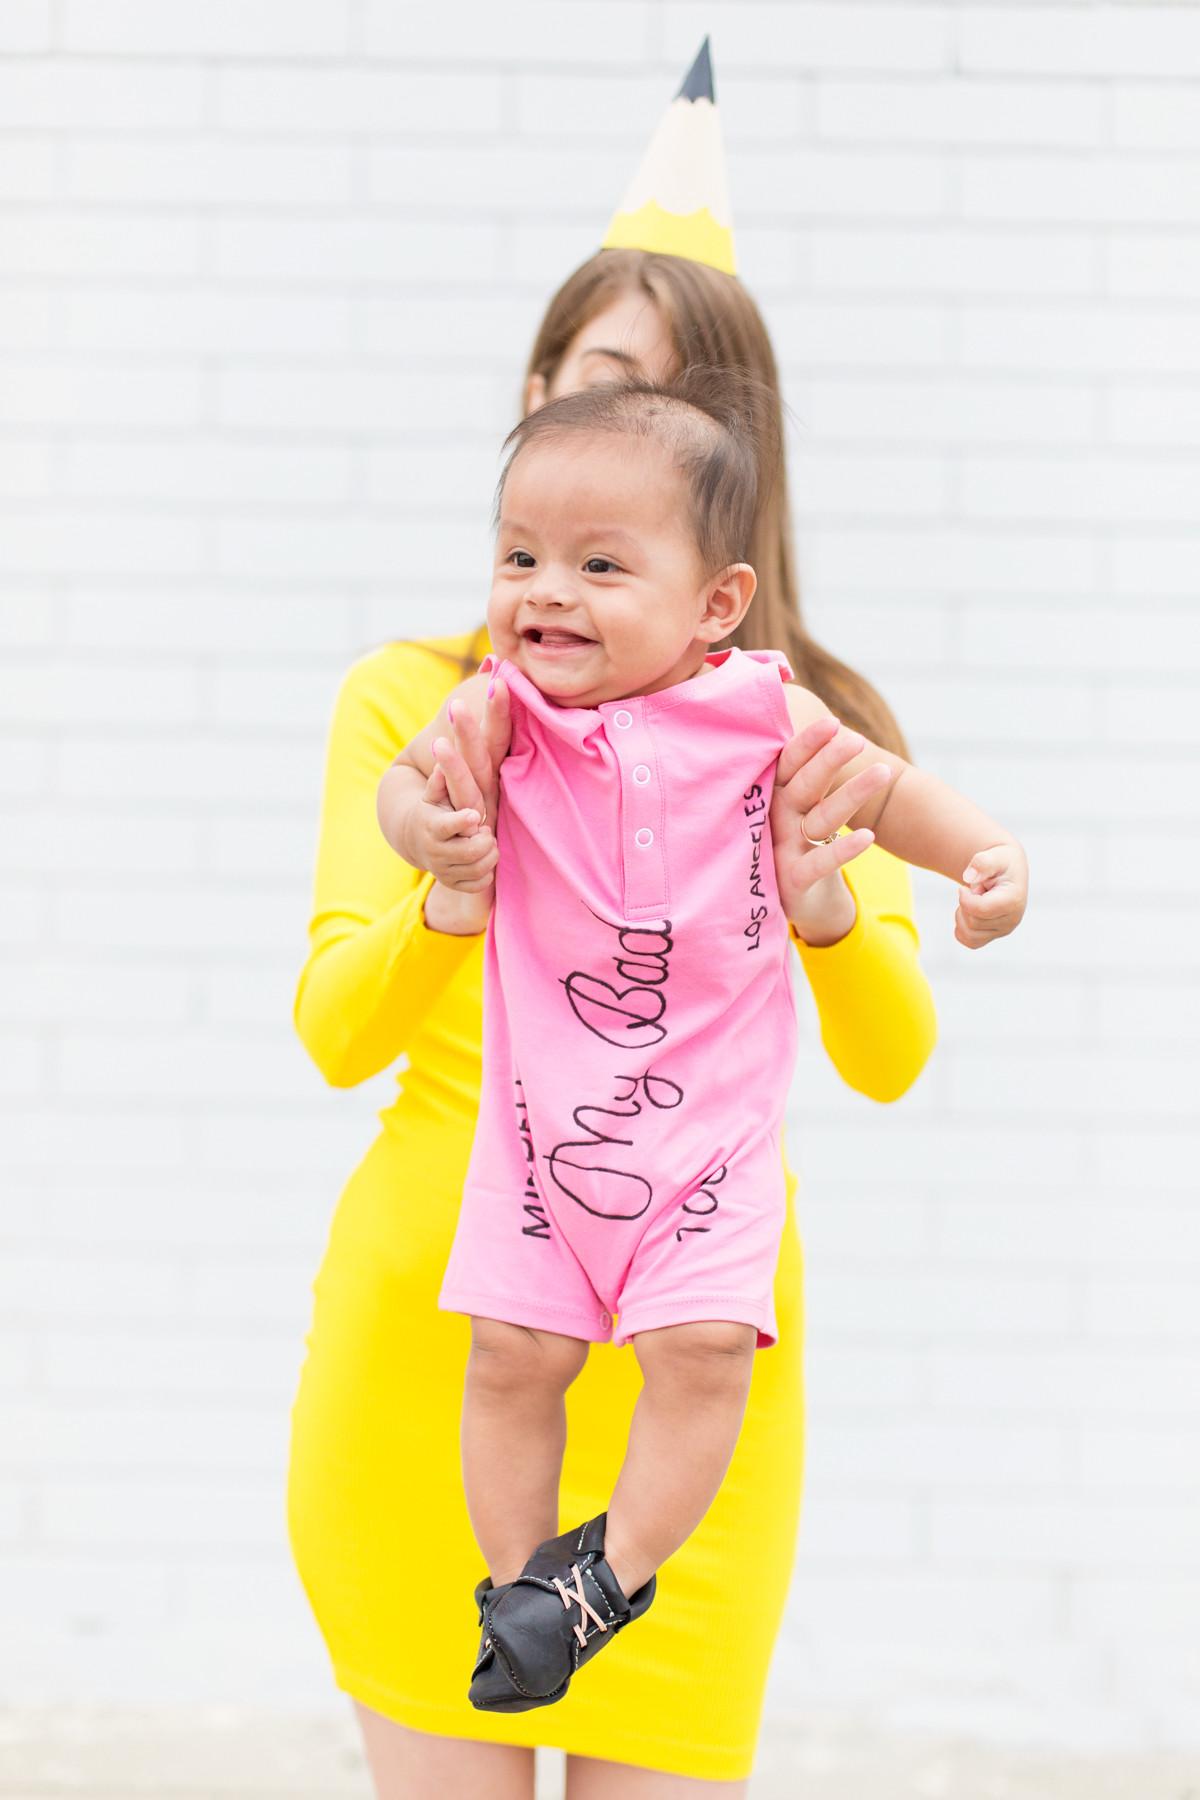 Toddler DIY Costumes  DIY School Supplies Family Costume Studio DIY